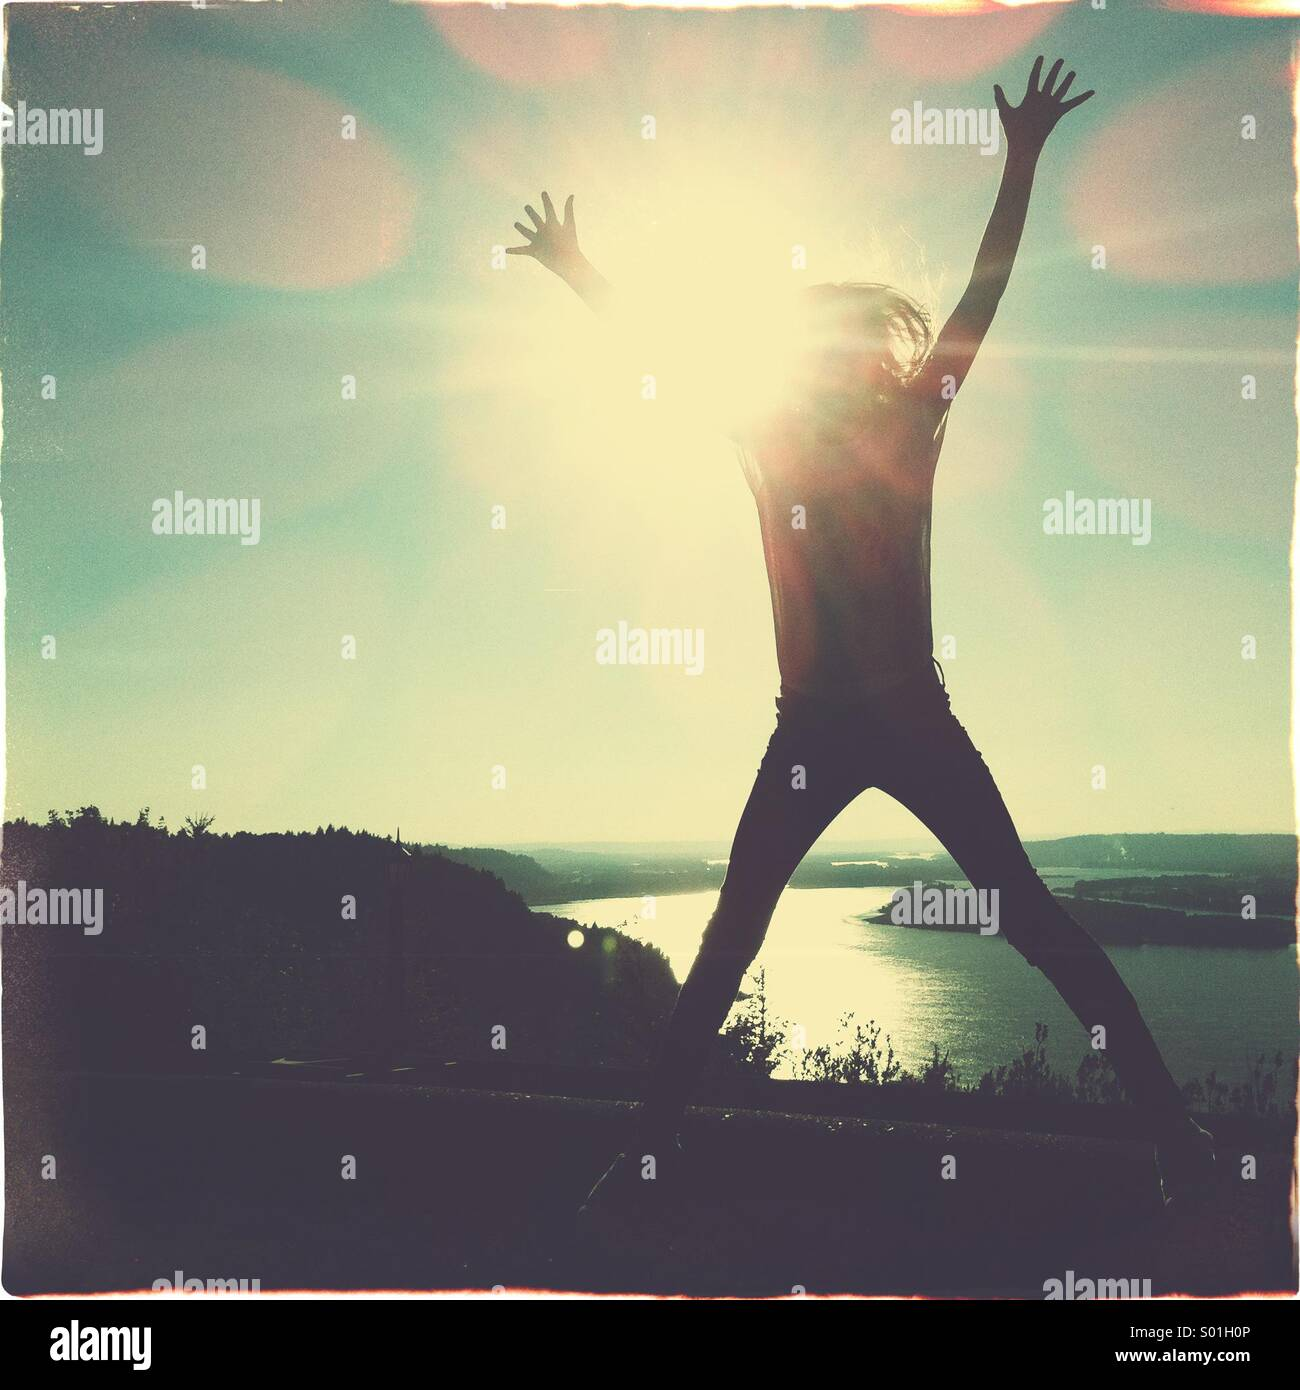 jump for joy - Stock Image